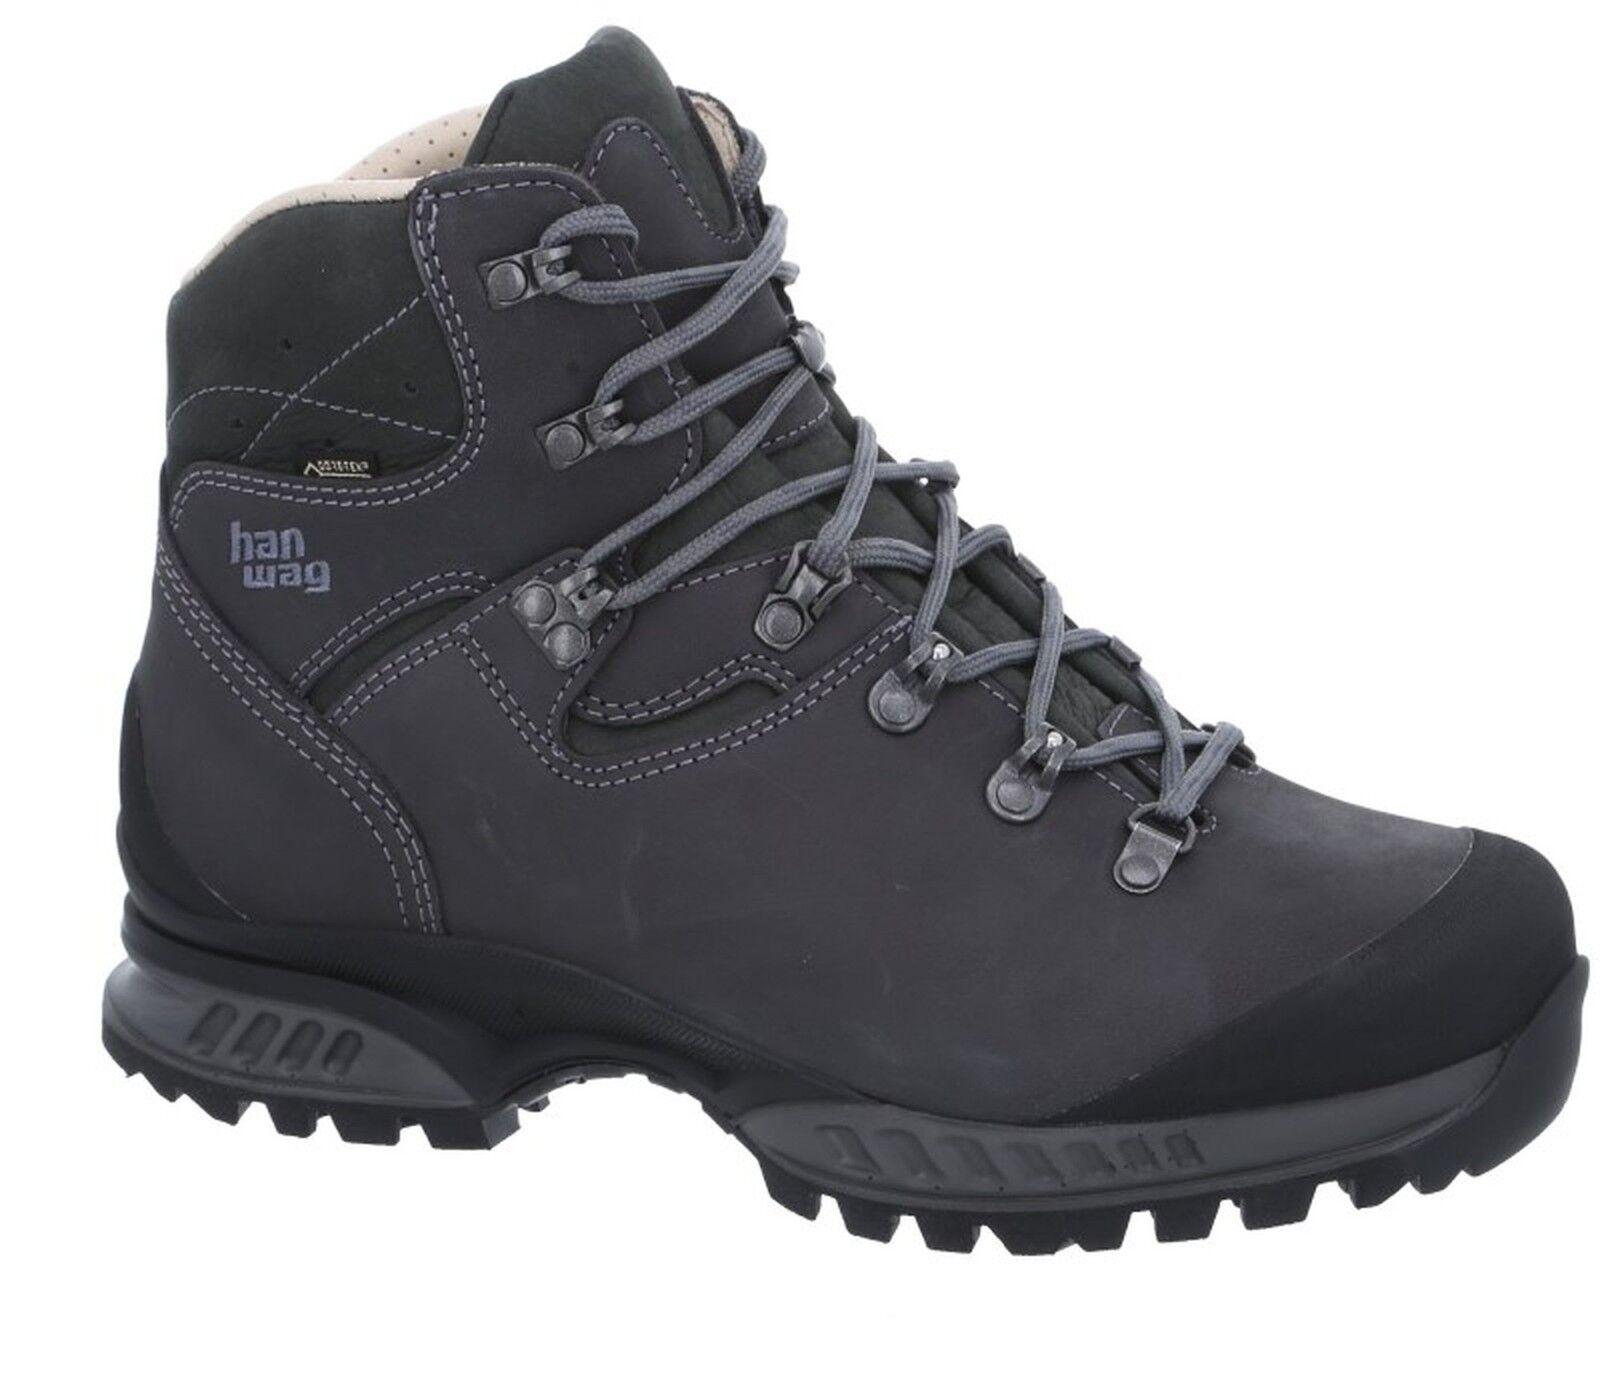 Hanwag Zapatos de Senderismo Tatra II de Ancho GTX Tamaño 9,5-44